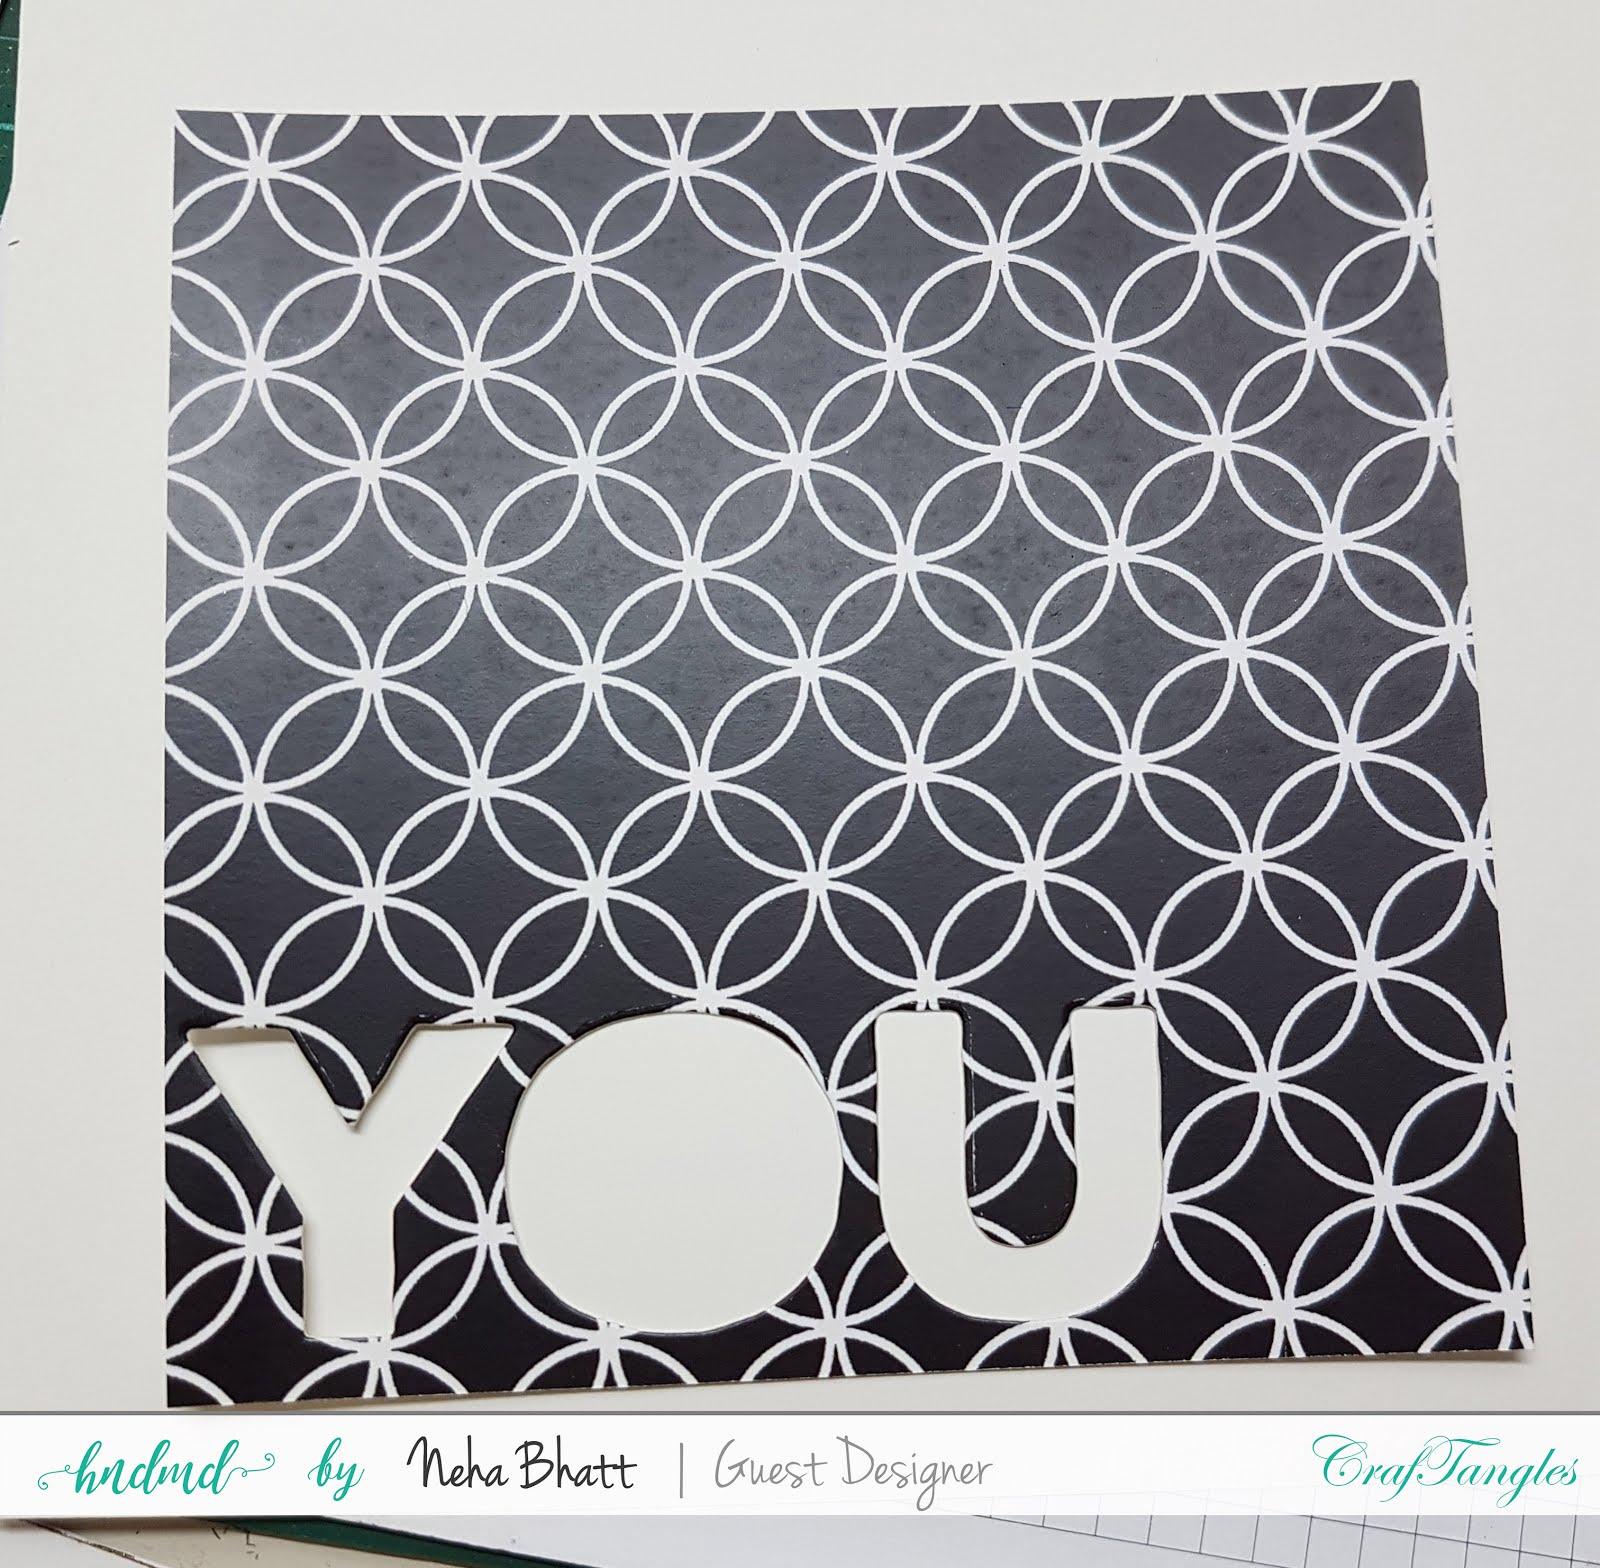 Foiled Cards by Neha Bhatt 8